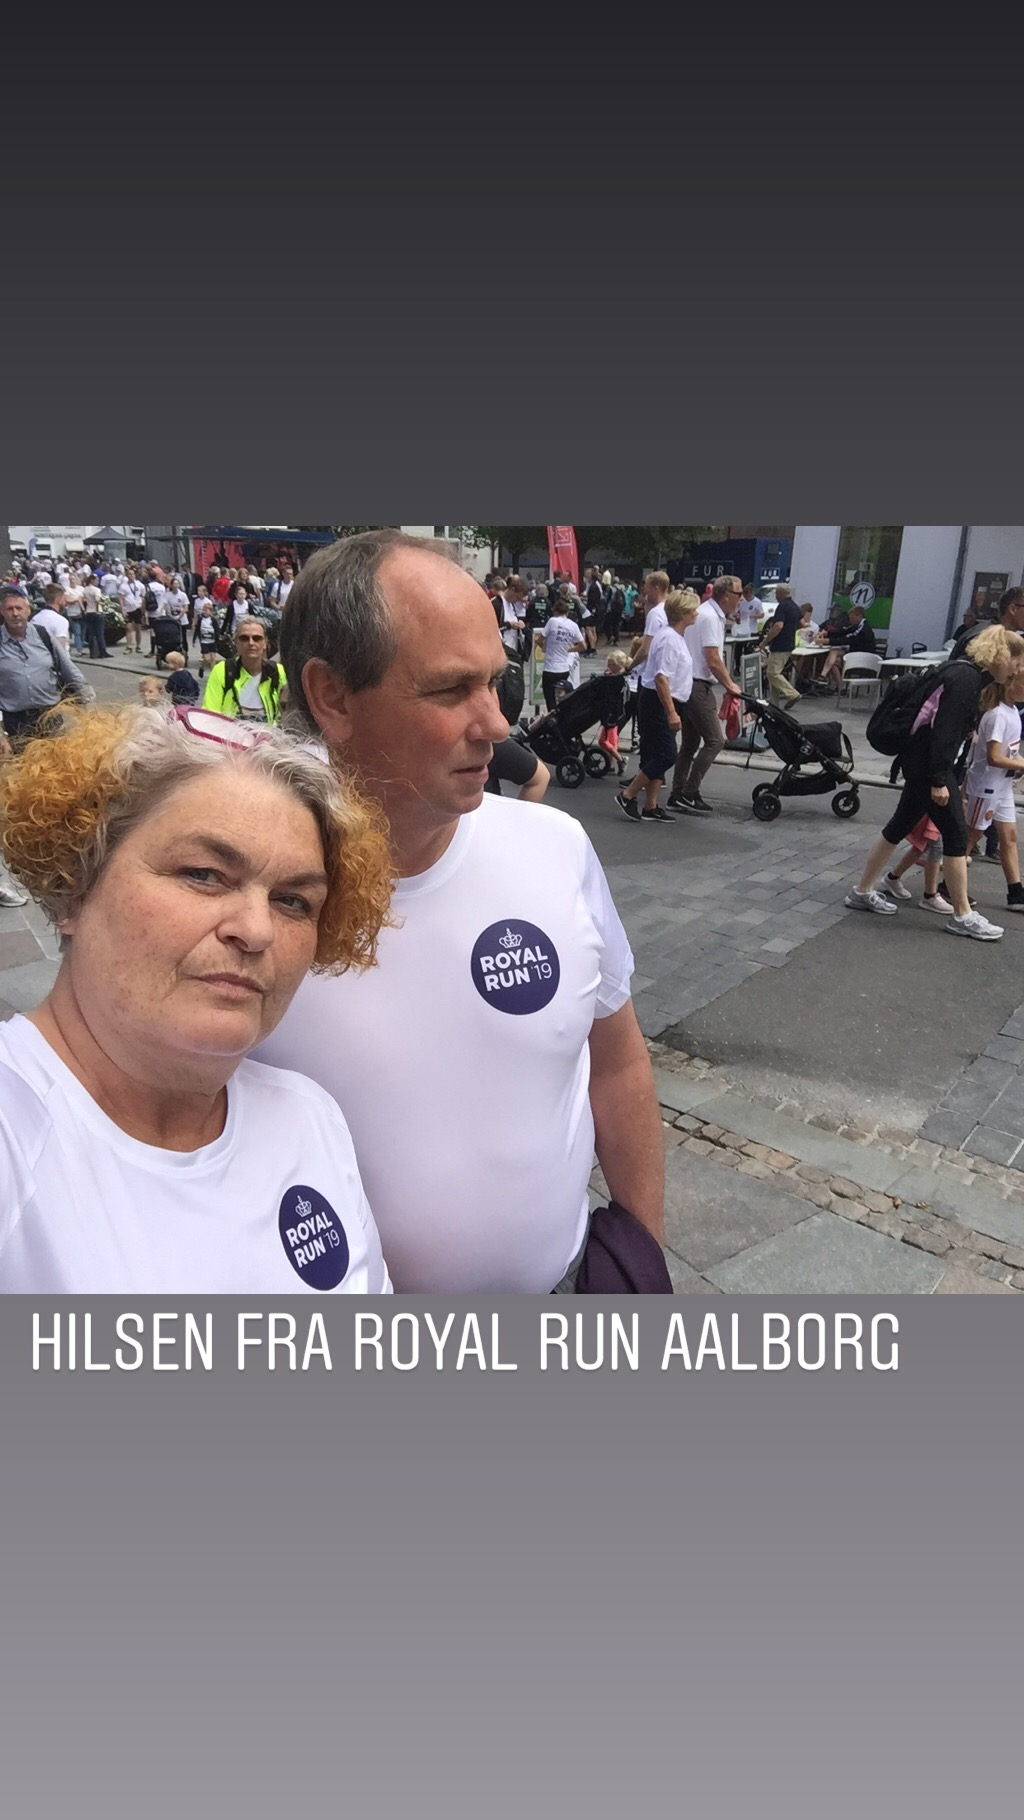 royal-run-2019-aalborg_48037384008_o